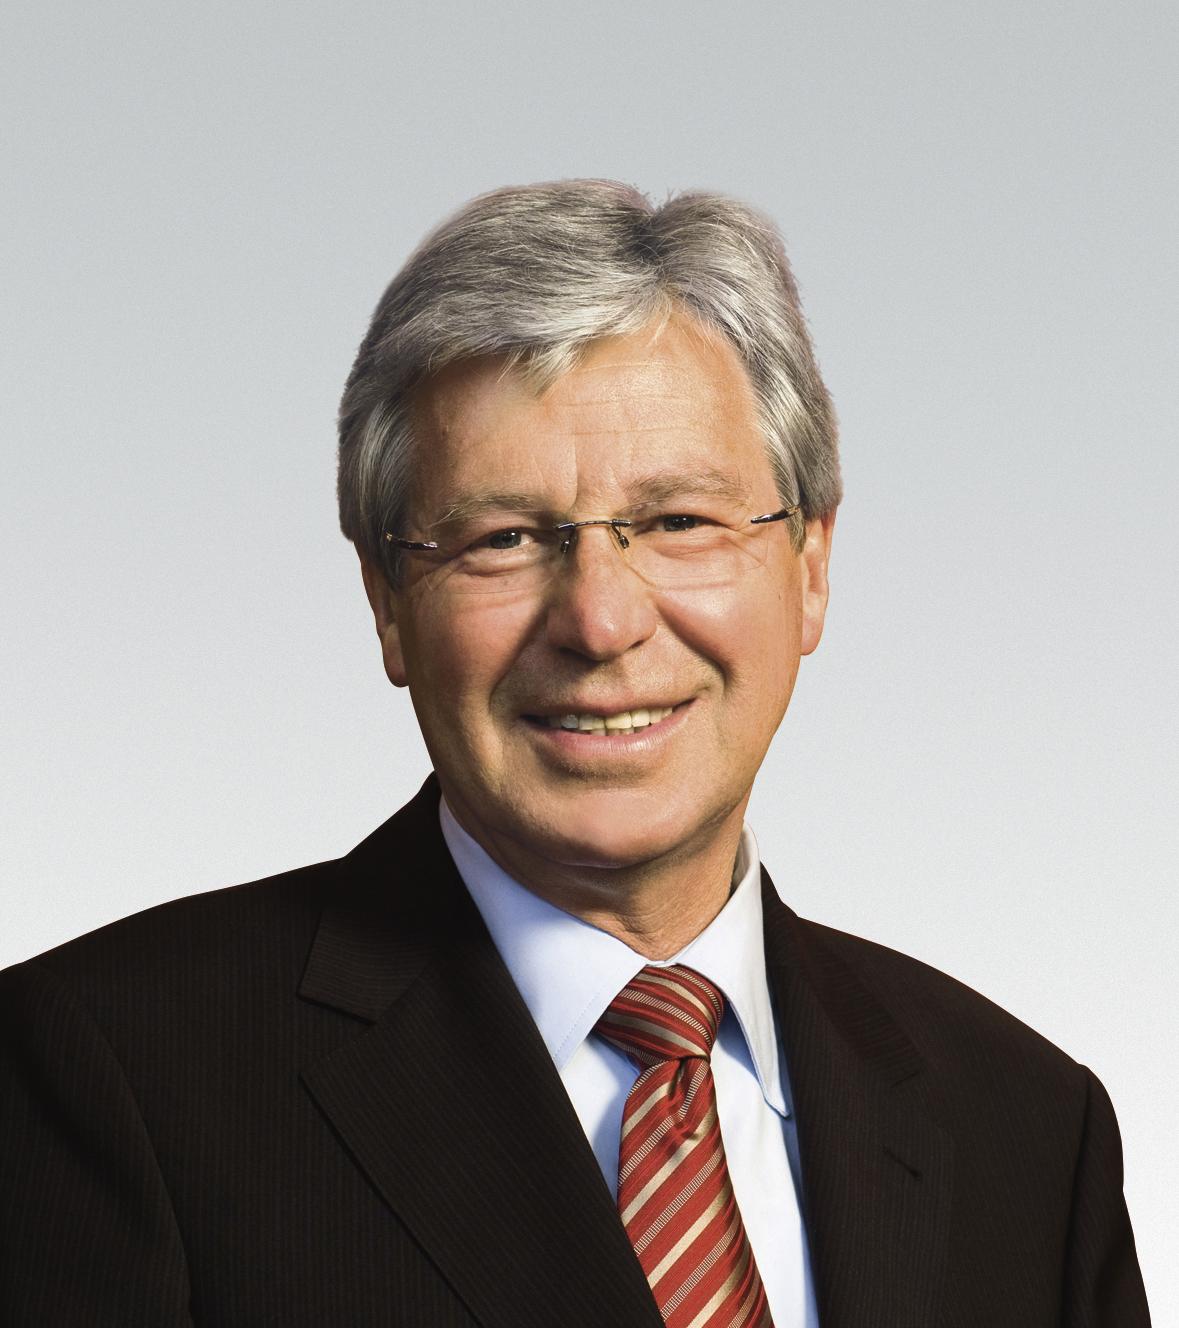 Jens Böhrnsen Größe